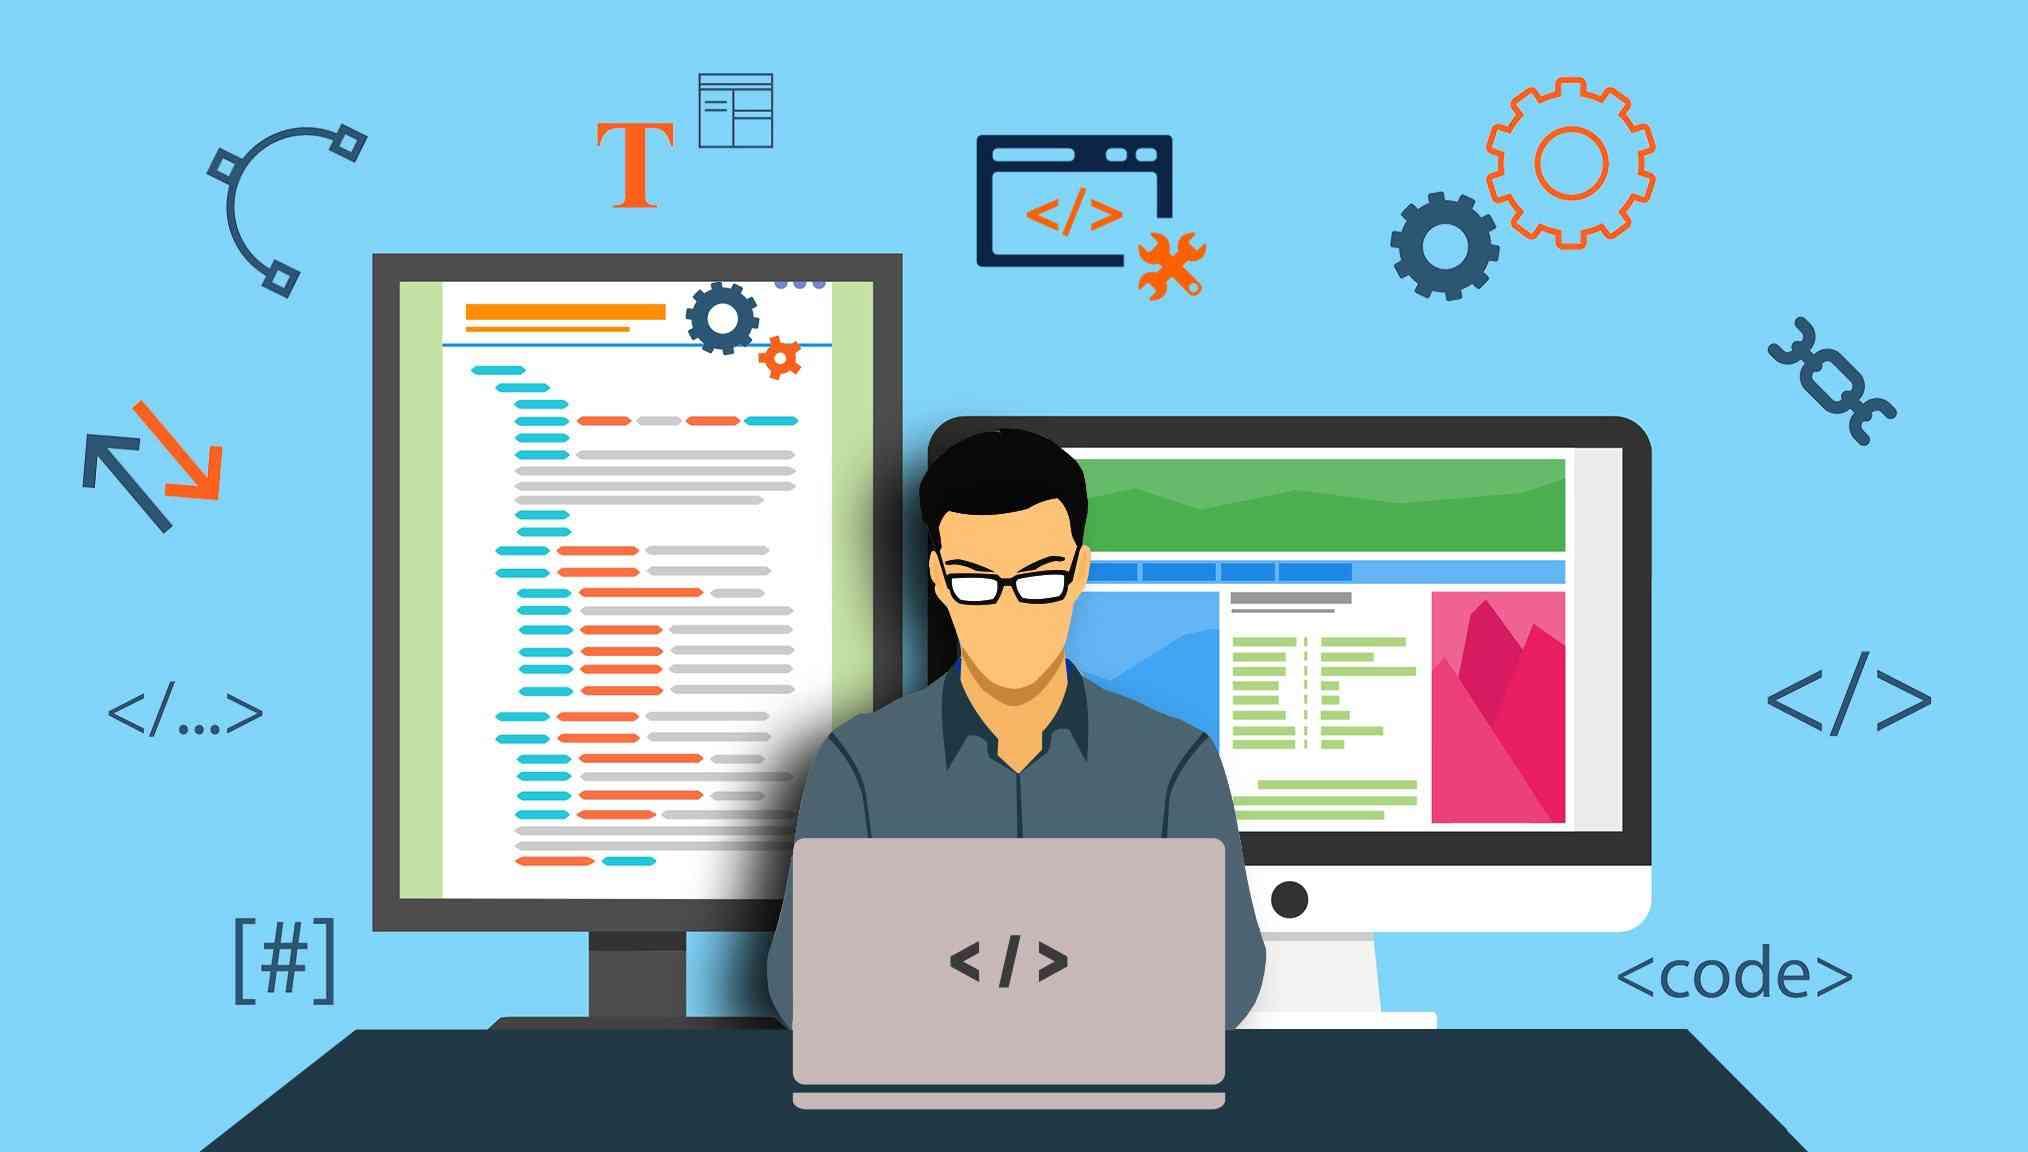 Front-end web development tutorials